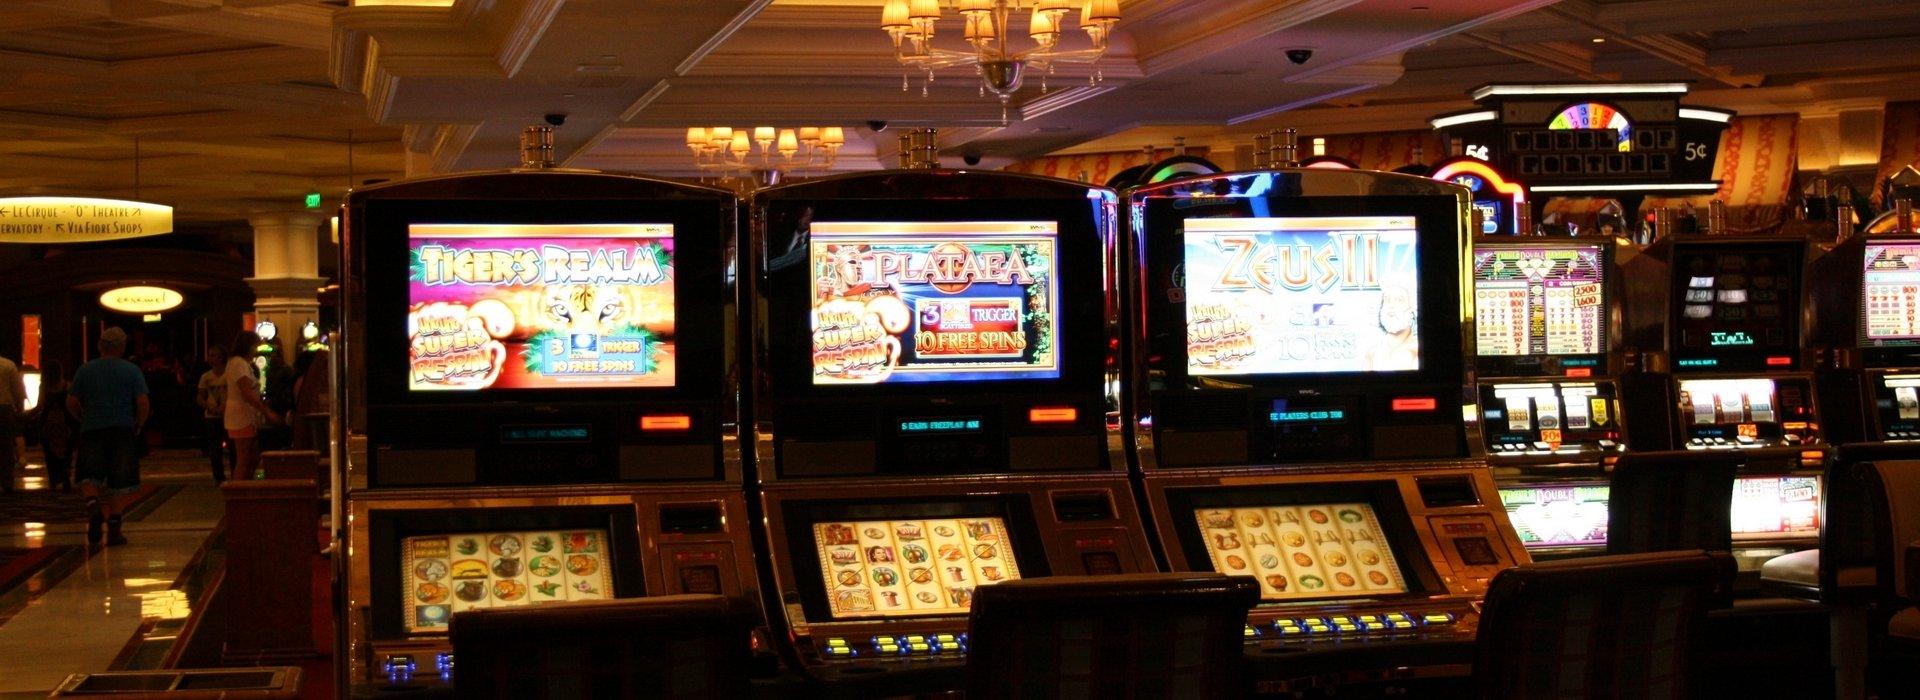 Elektronische Kasinos